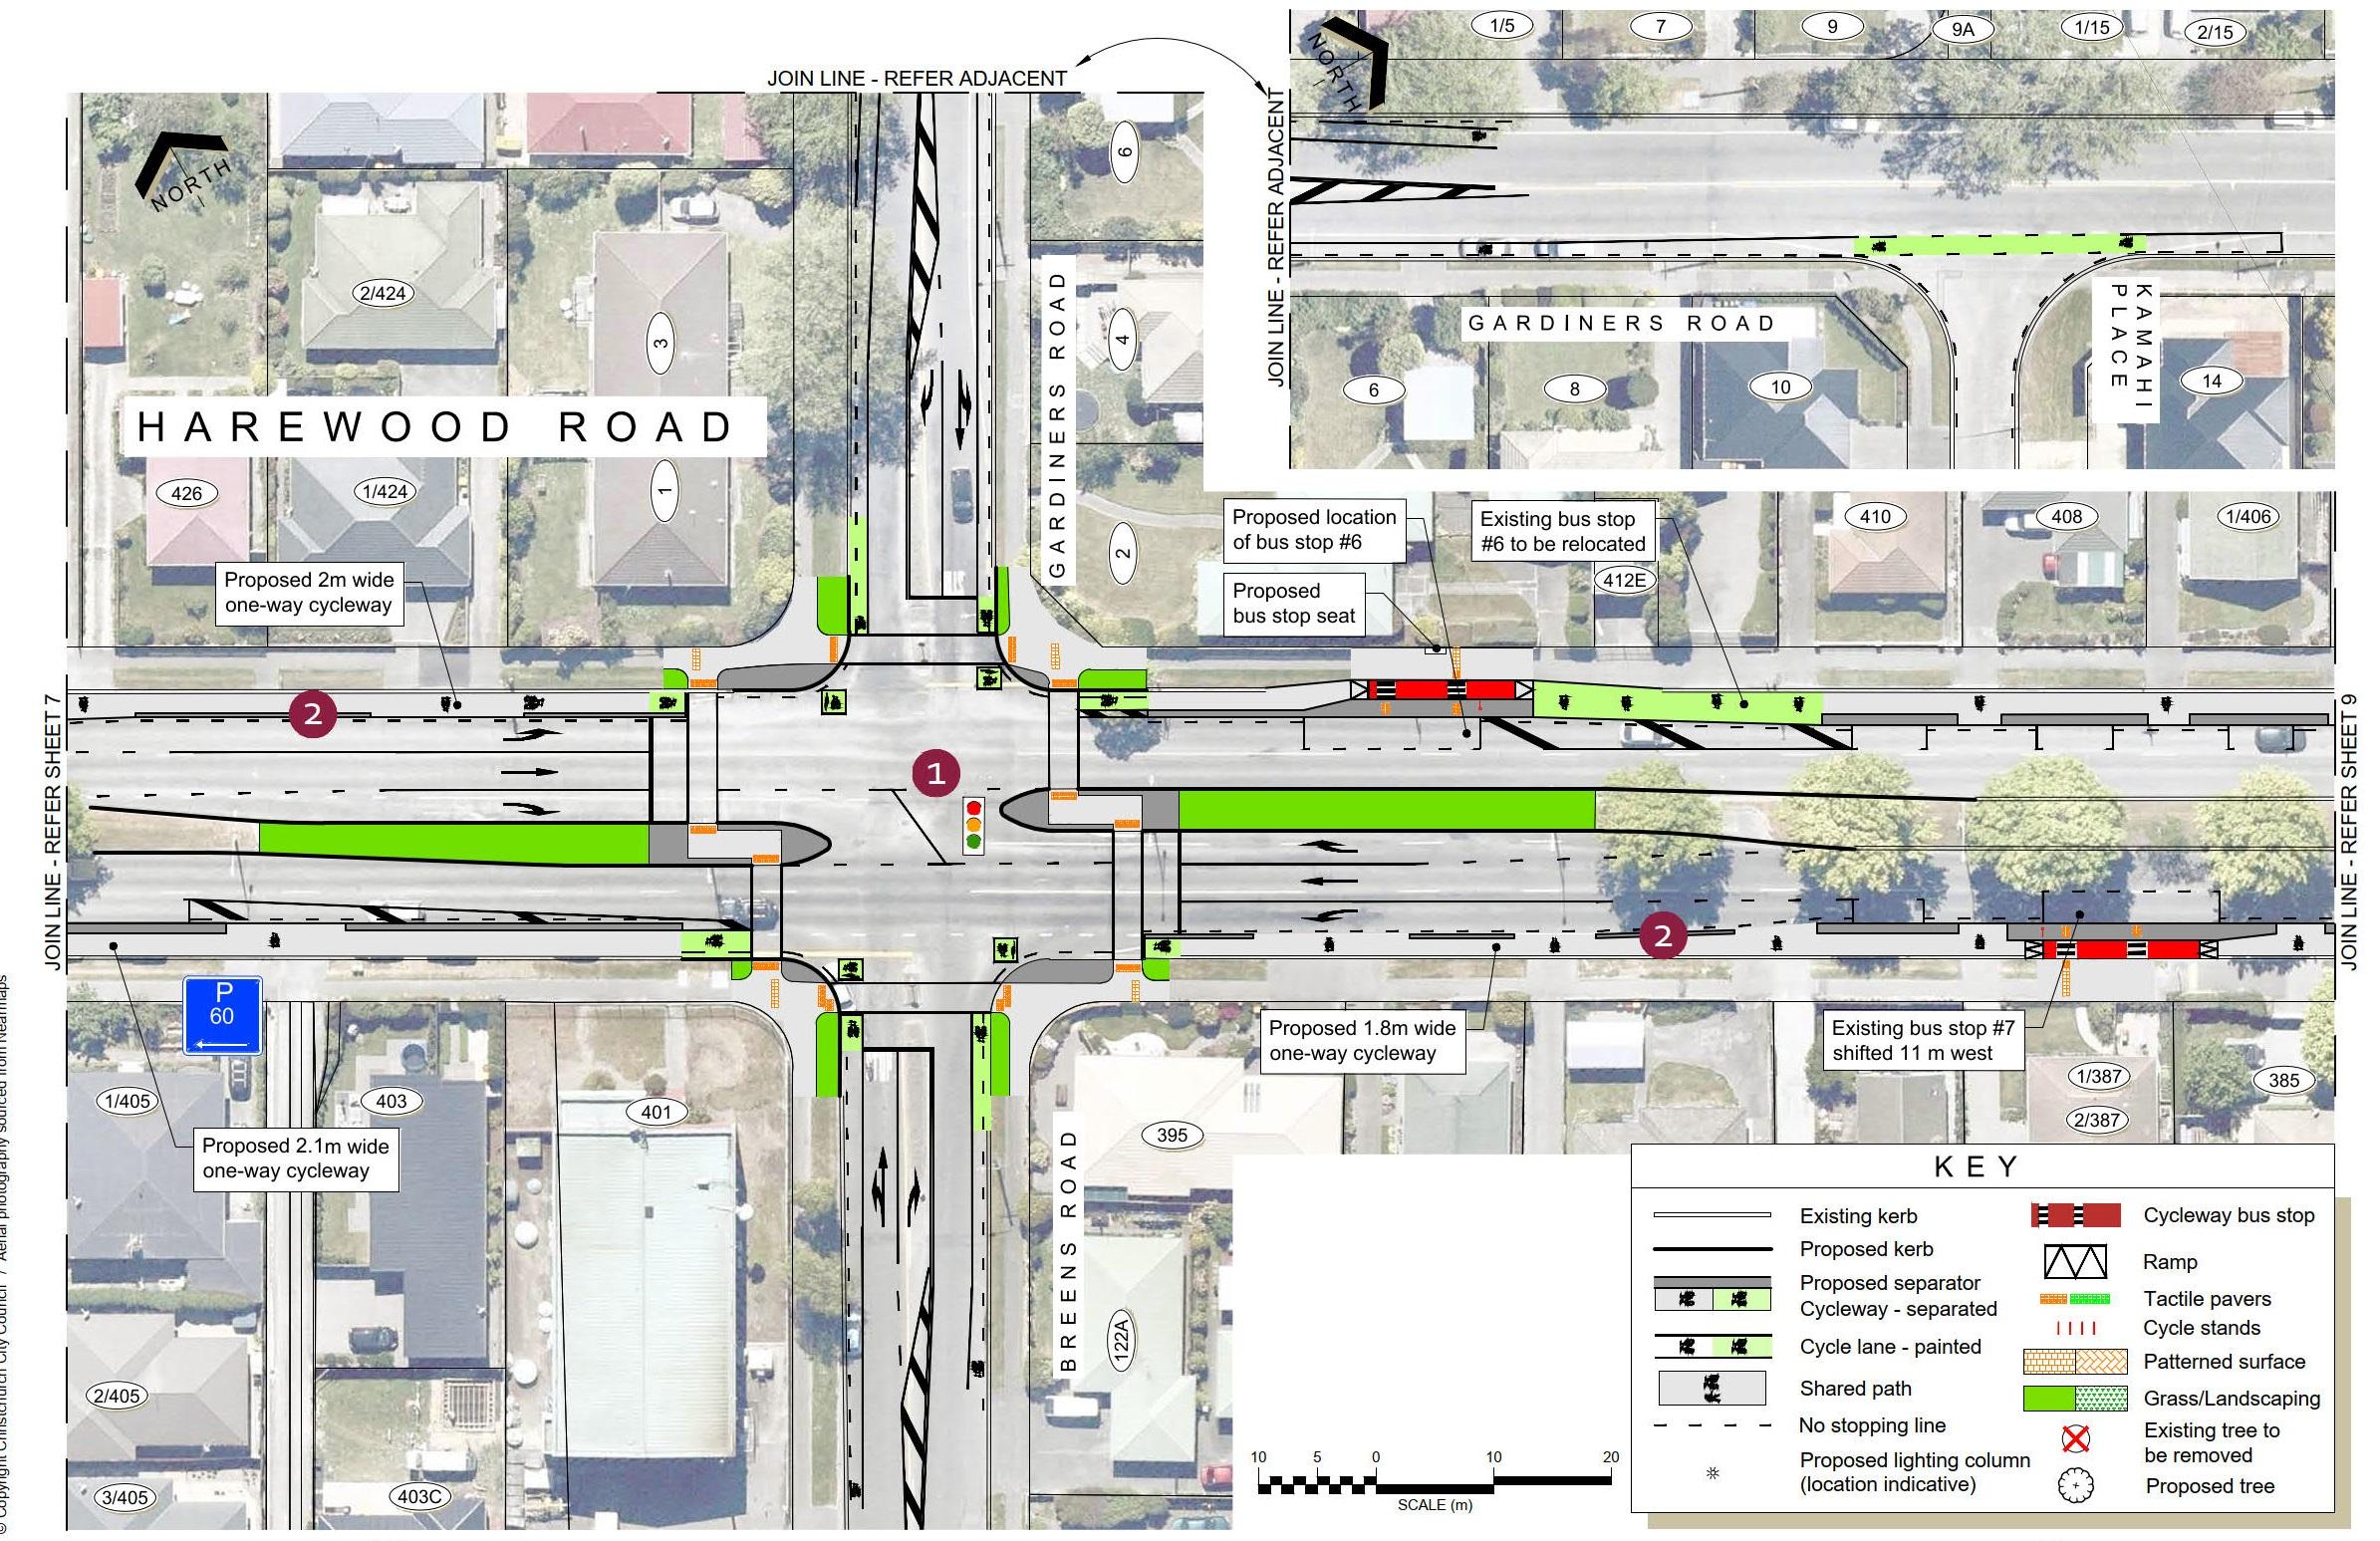 Plan 8 - Harewood Road, Gardiners Road, Breens Road intersec